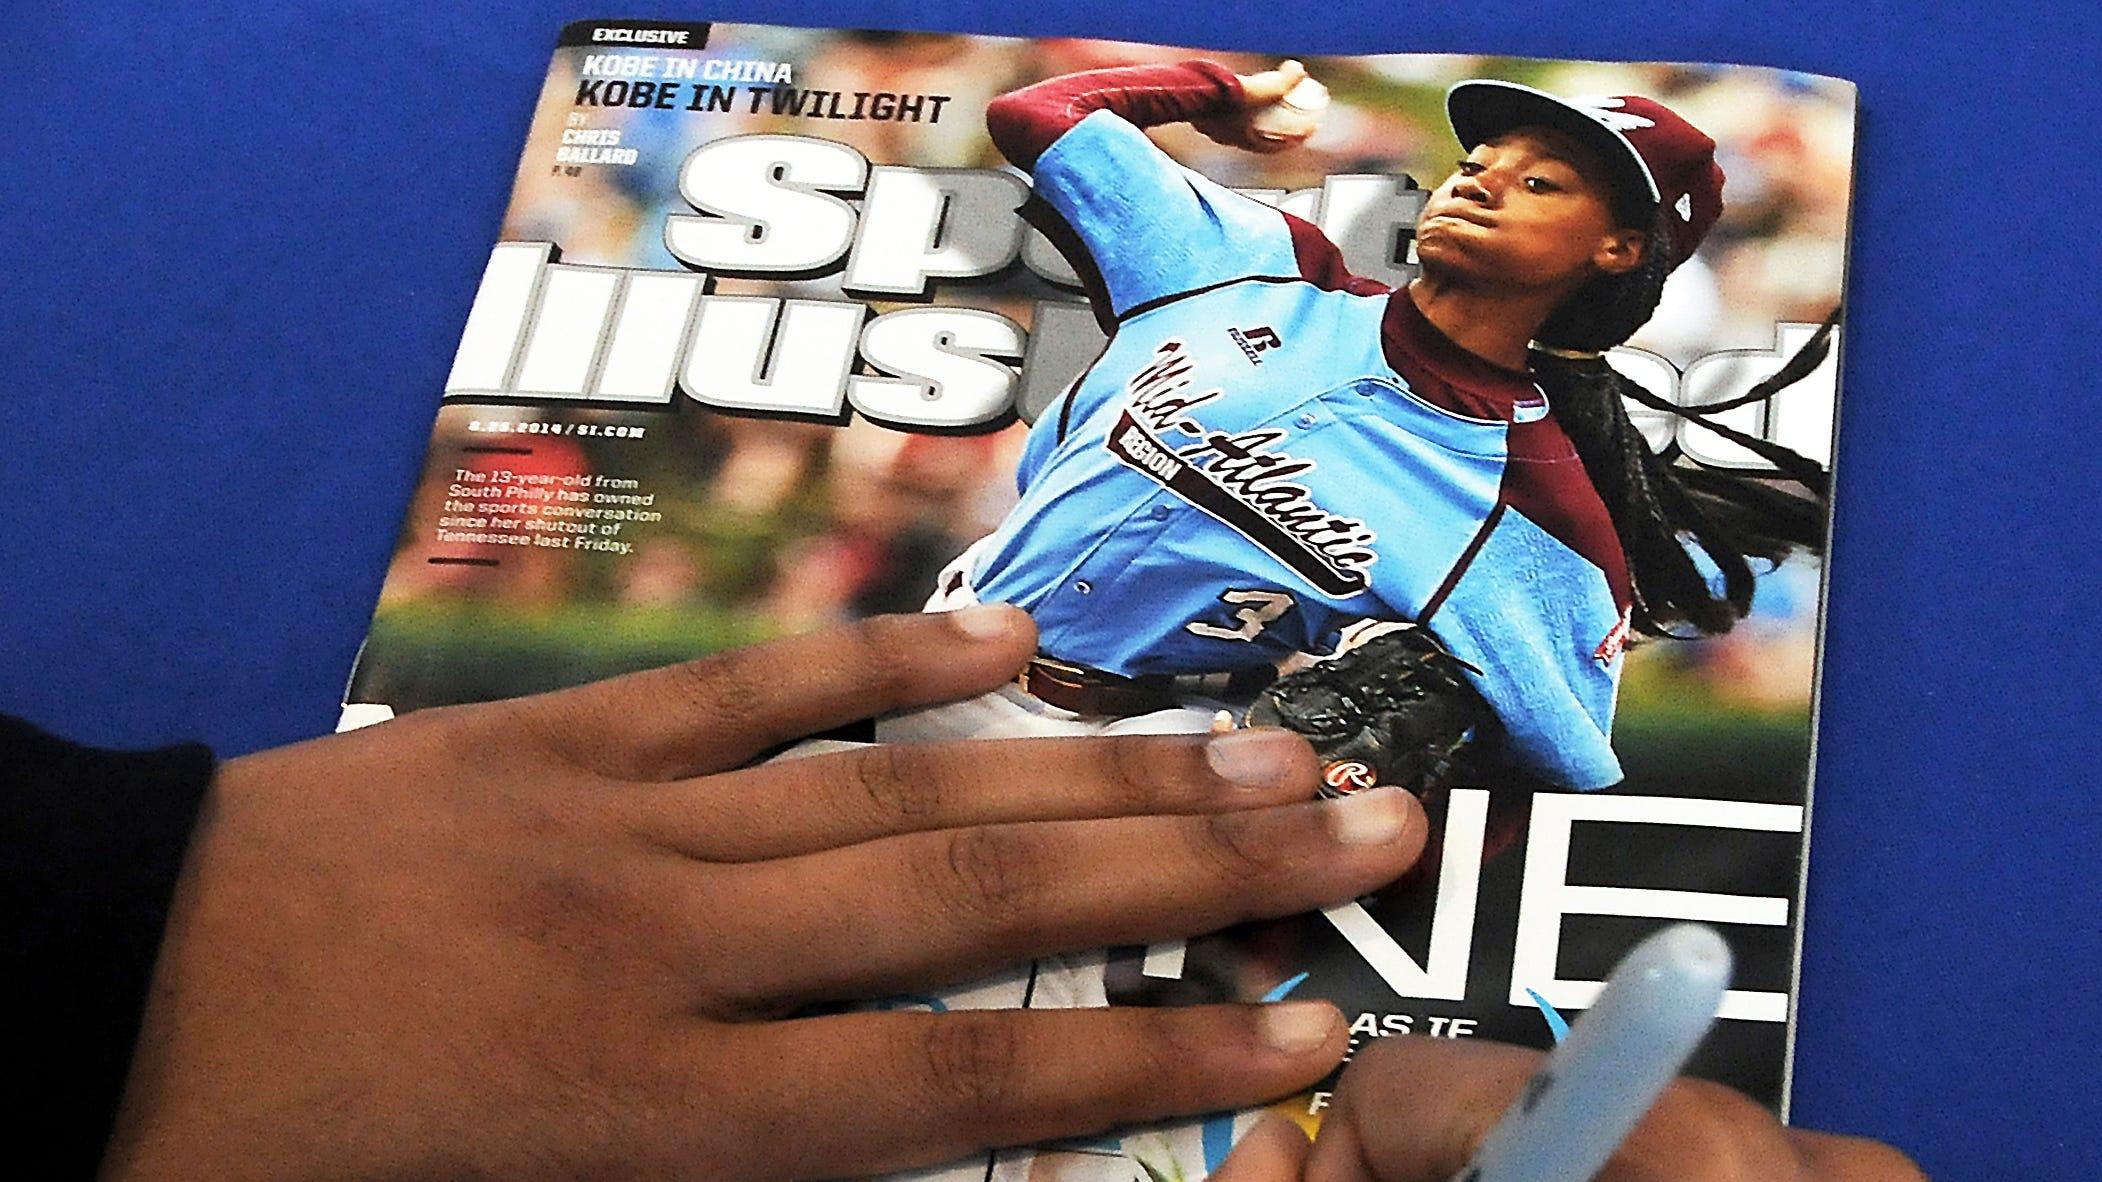 Sports Illustrated, under new management, cuts 40 staff jobs